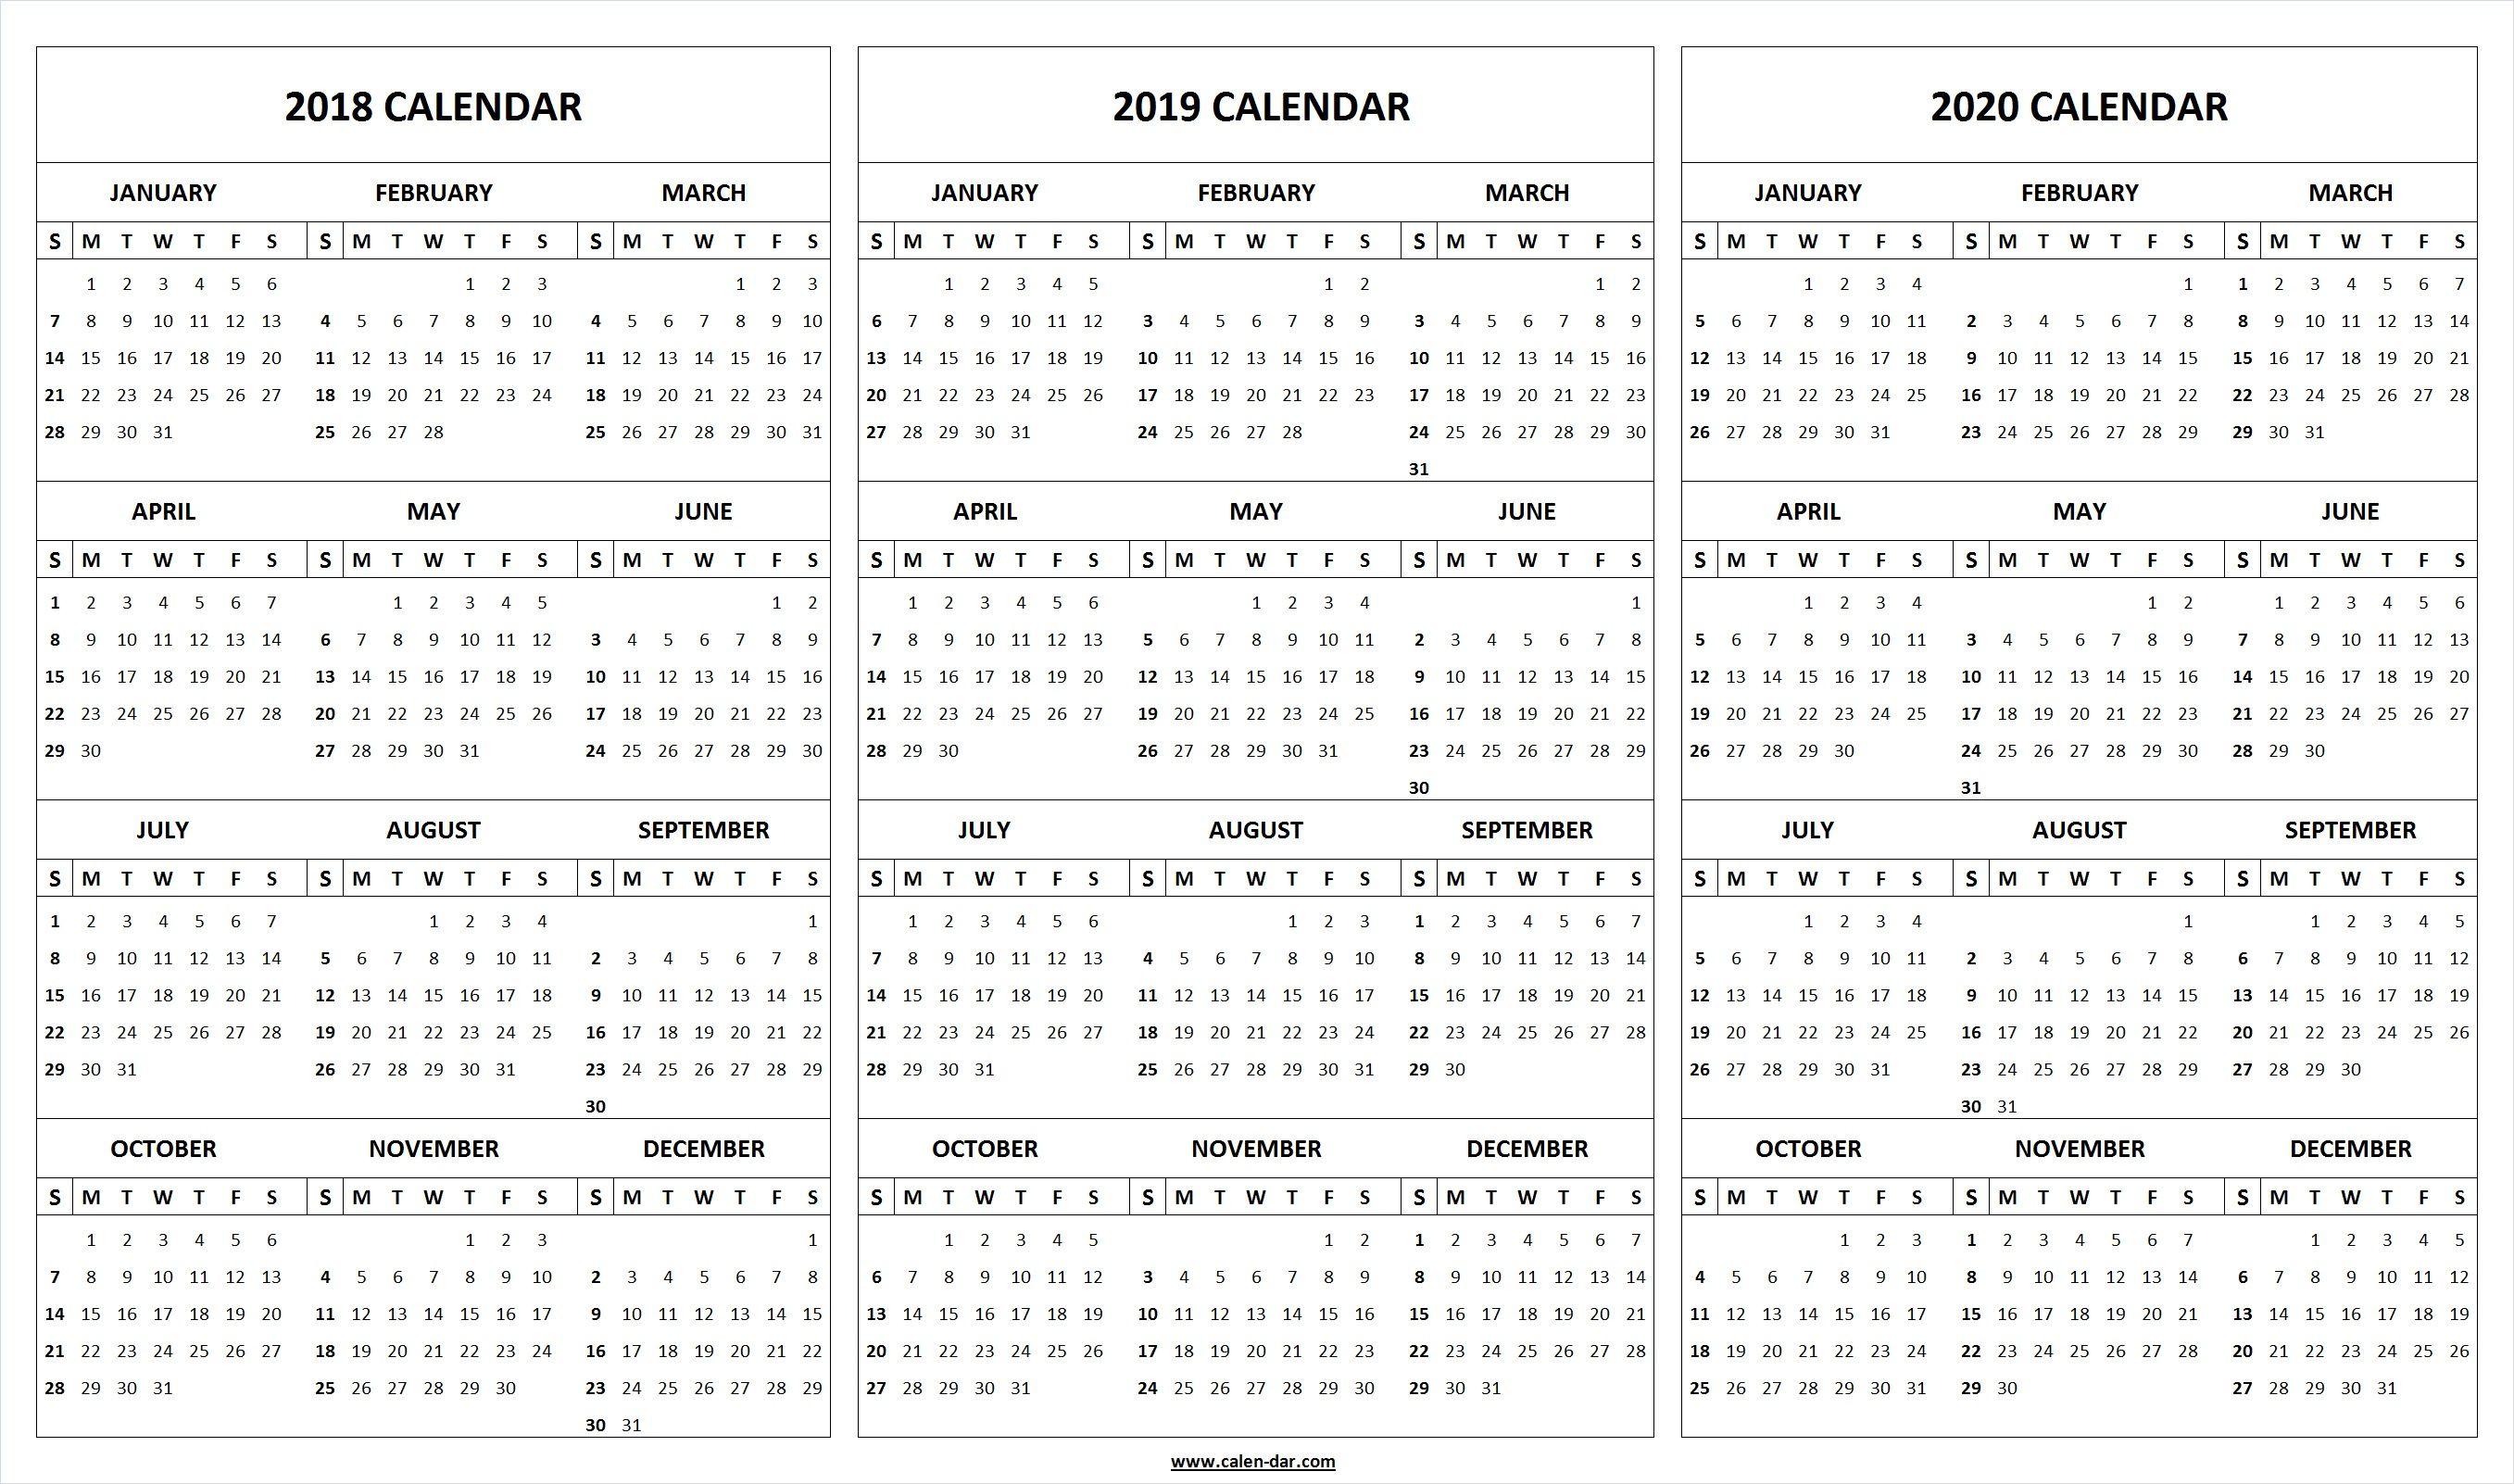 Print Blank 2018 2019 2020 Calendar Template | Organize! | 2019 within 2020 Calendar Printable One Page